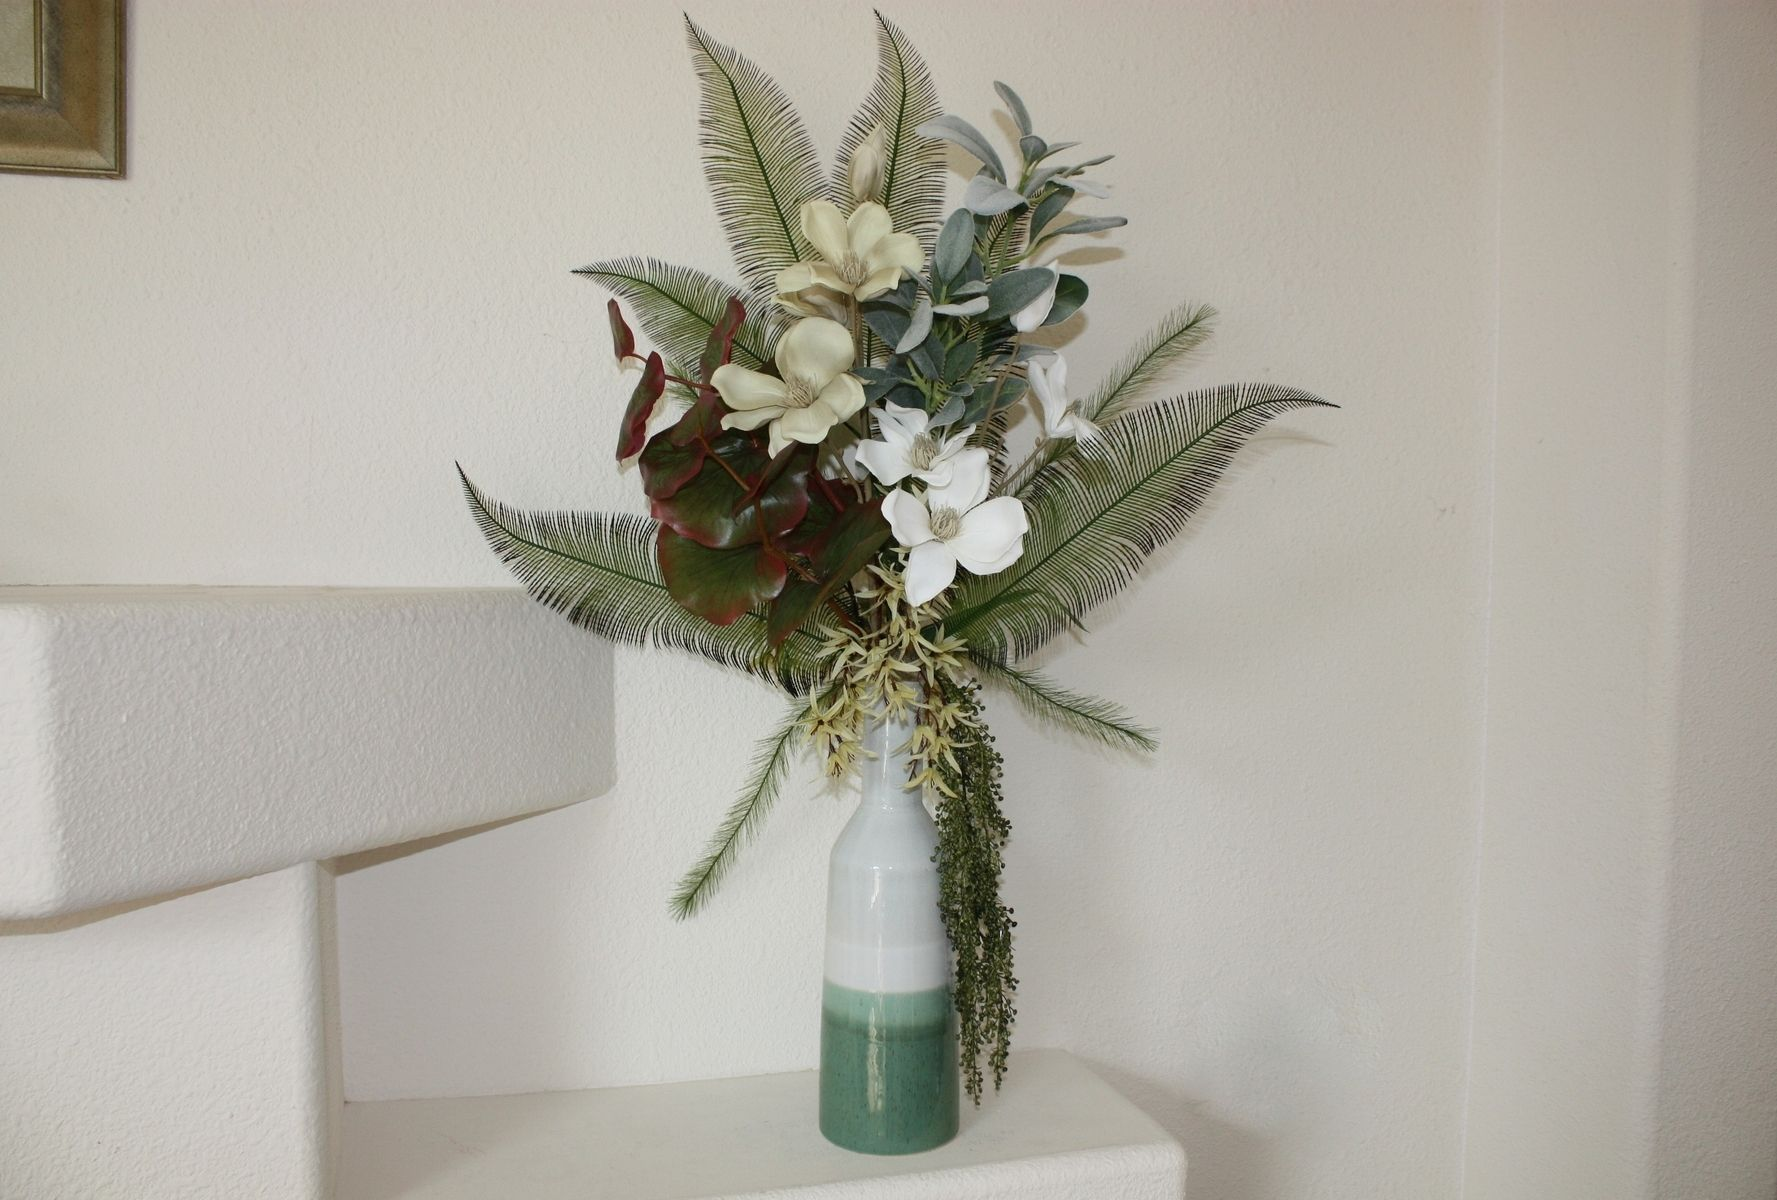 Handmade Tropical Decor Large Silk Flower Arrangement Floral Home